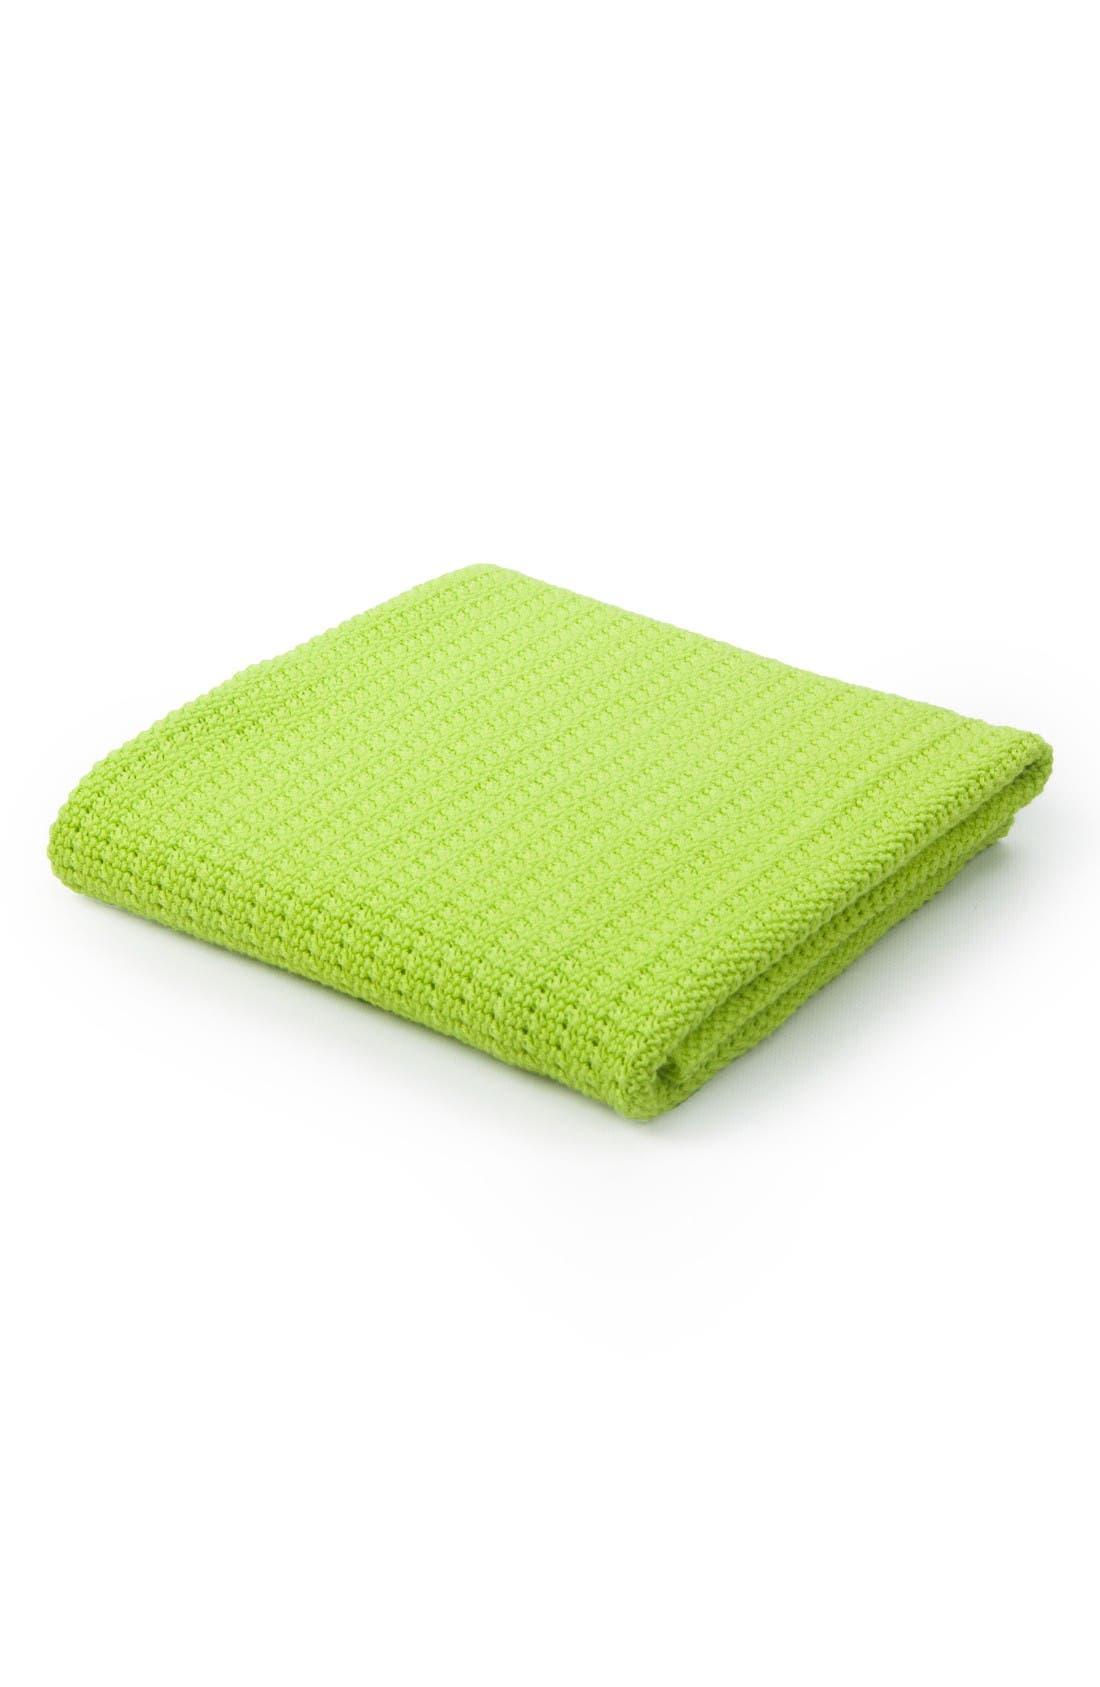 Alternate Image 1 Selected - Moba Cellular Cotton Baby Blanket